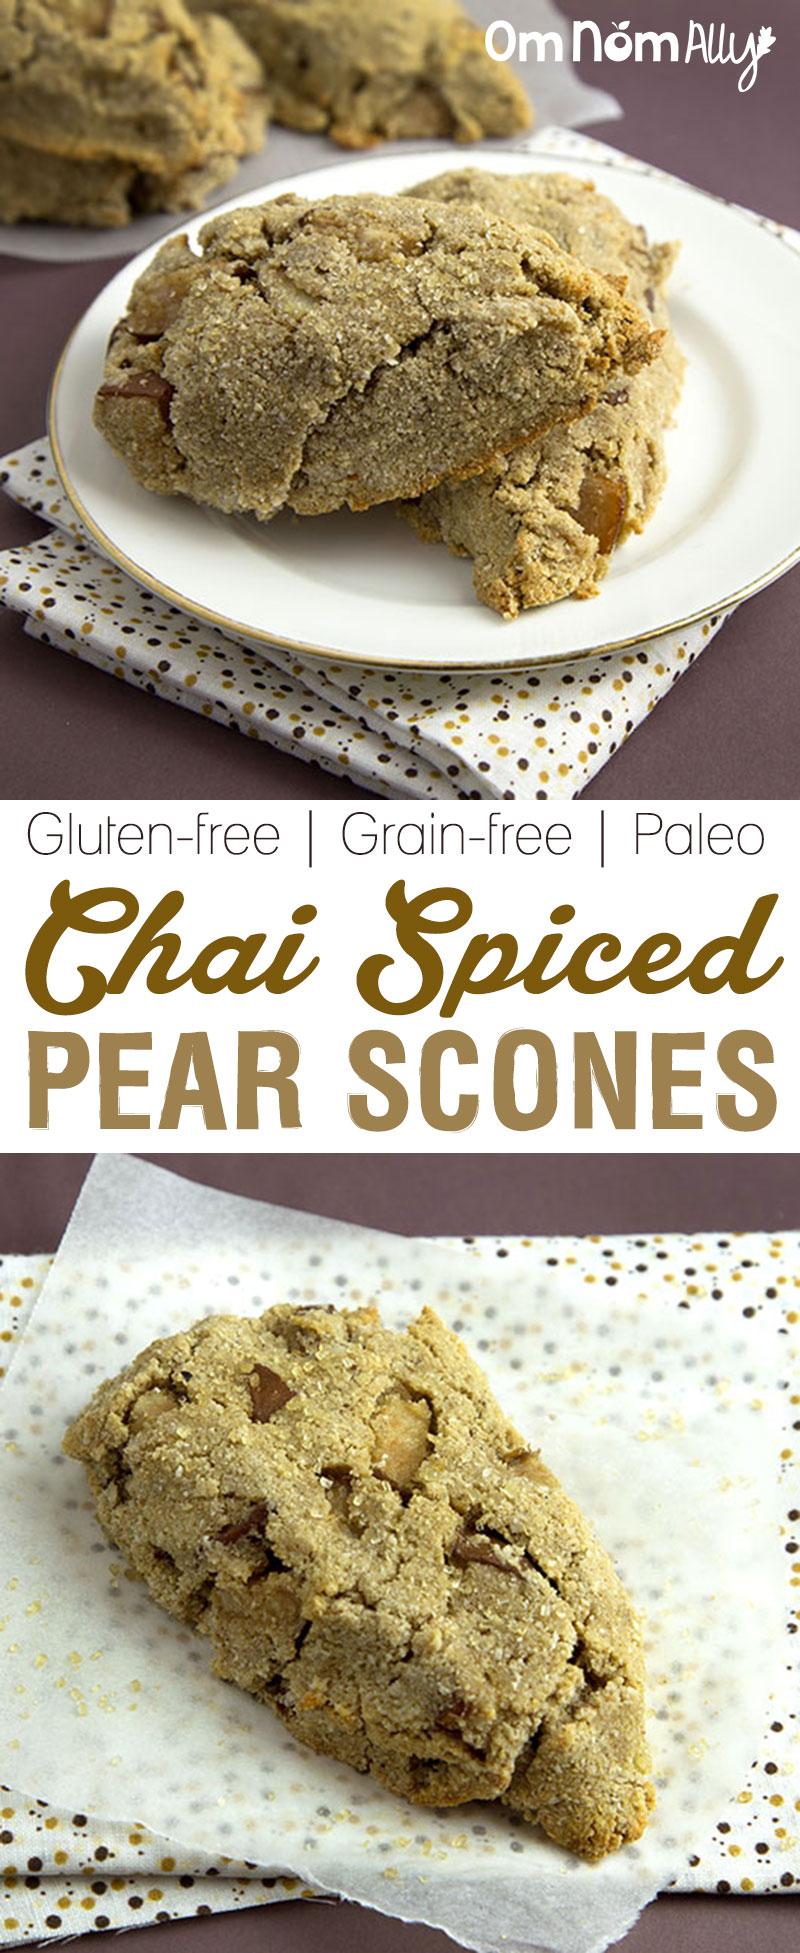 Grain-Free & Paleo Chai Spiced Pear Scones